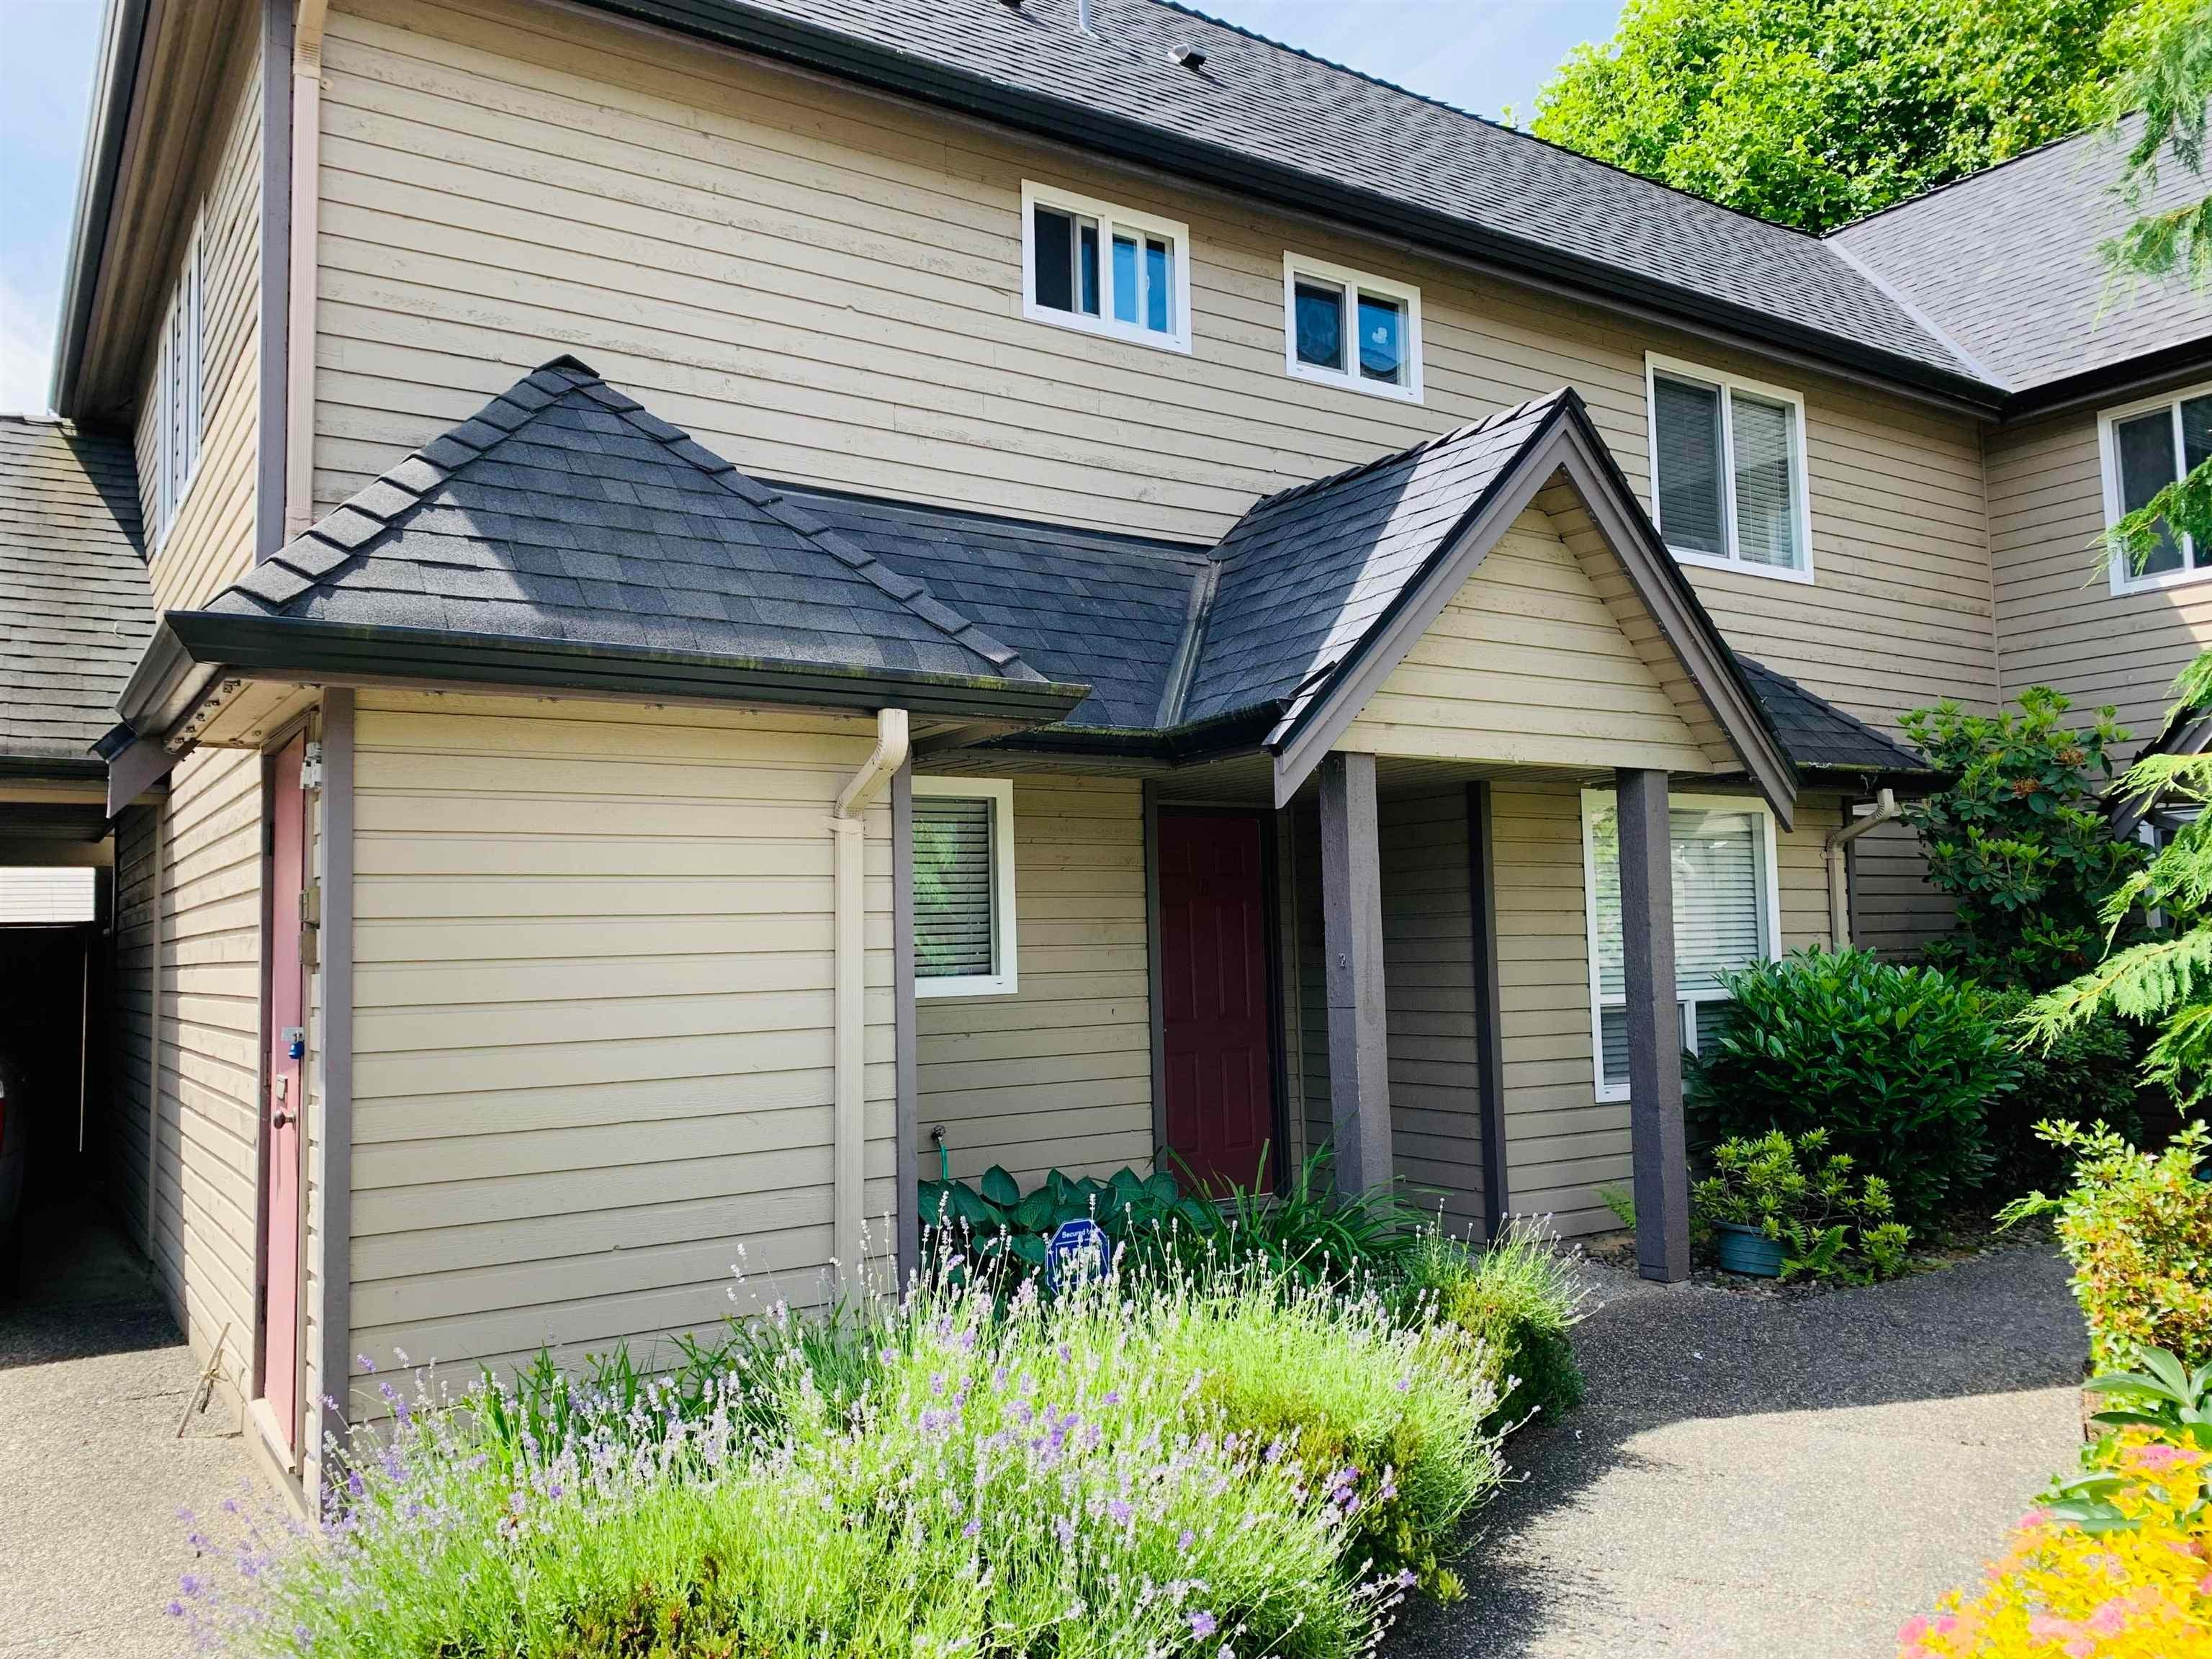 15 8631 NO. 3 ROAD - Broadmoor Townhouse for sale, 3 Bedrooms (R2595154)